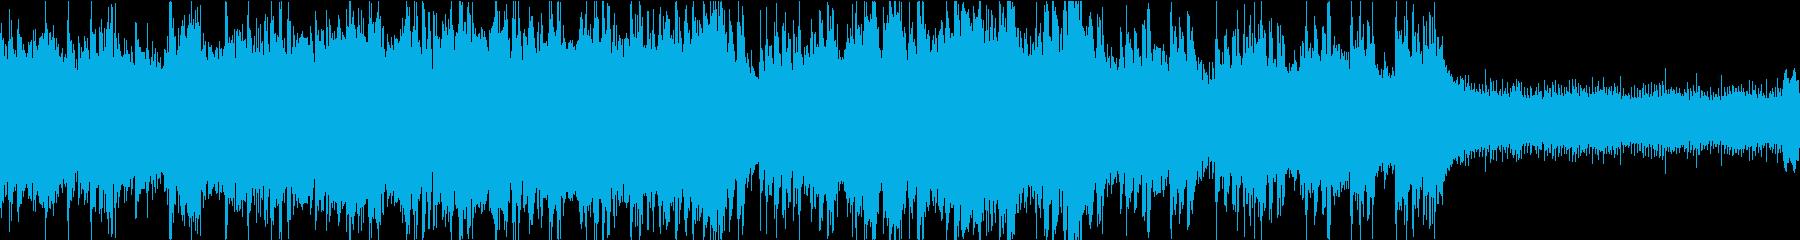 BGM/RPG向け/フィールド/ダンジョの再生済みの波形